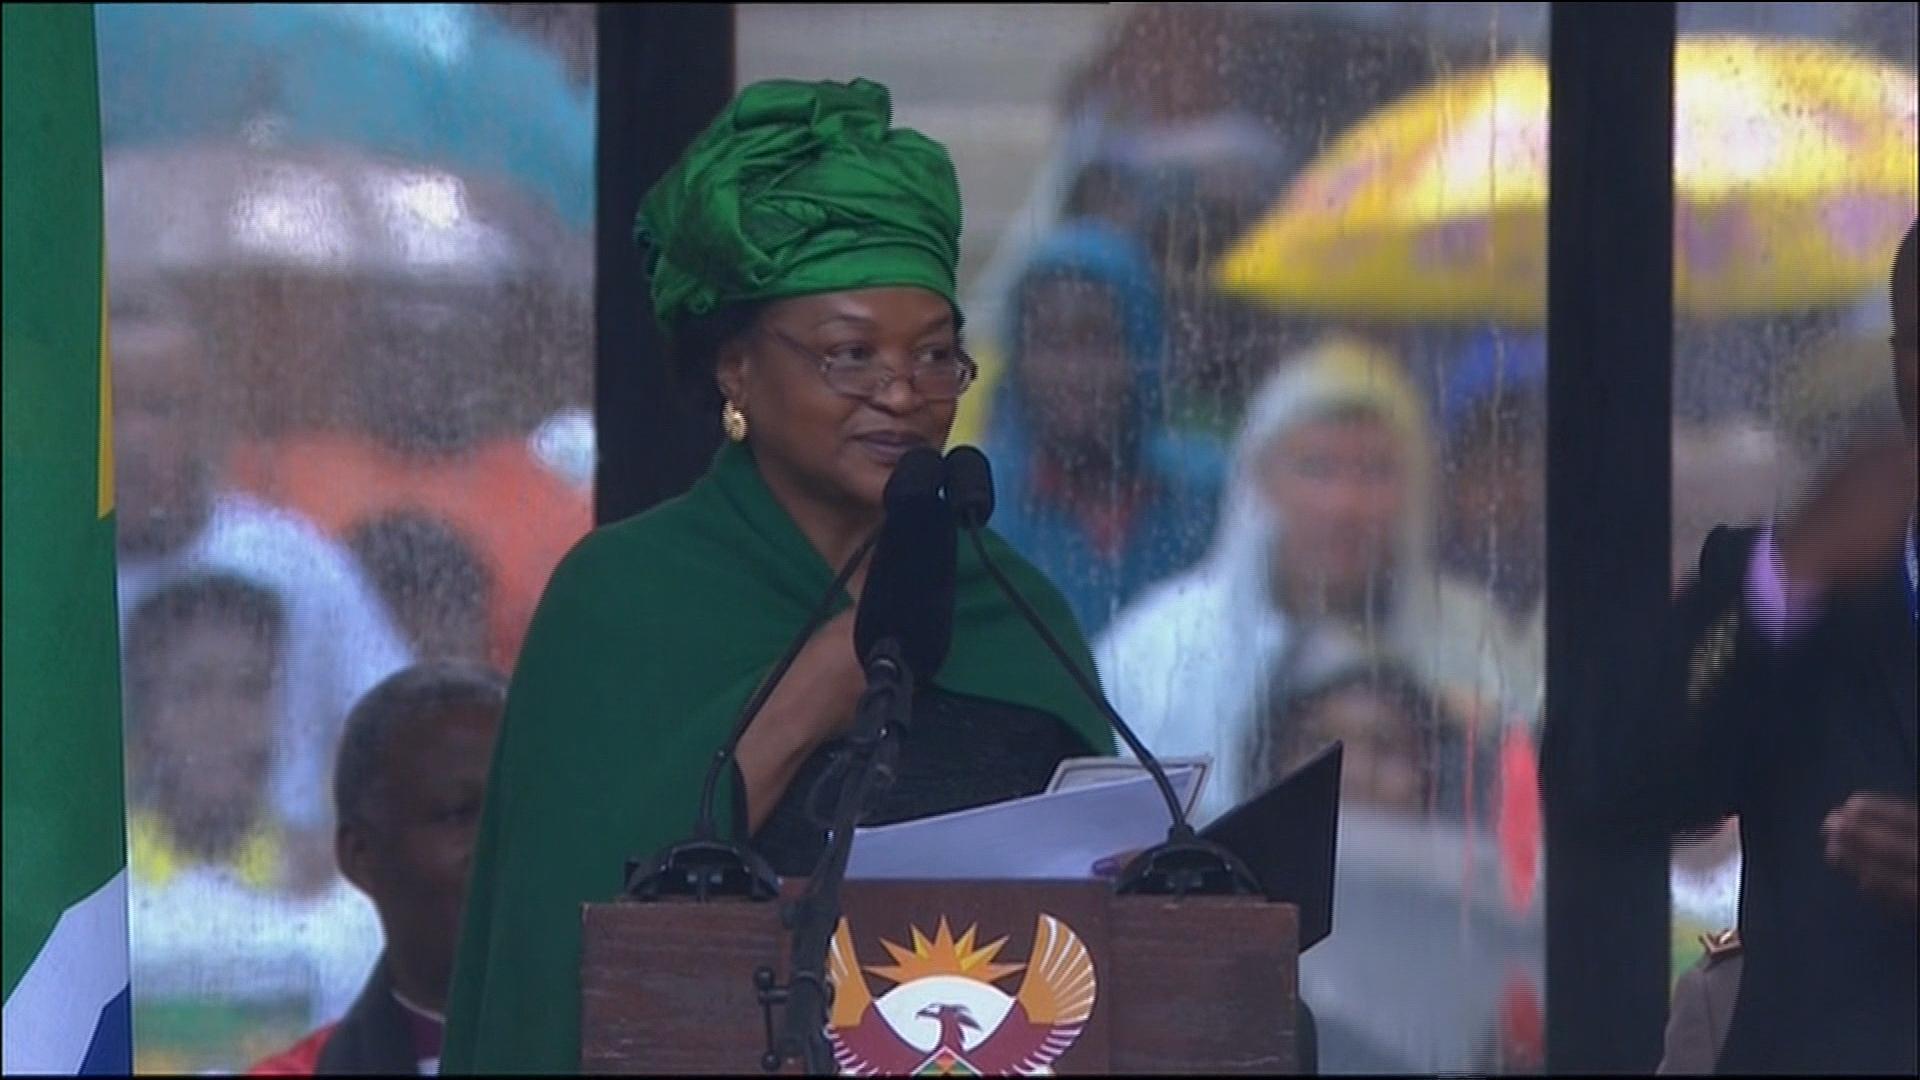 Hearty reception for Obama at Mandela funeral